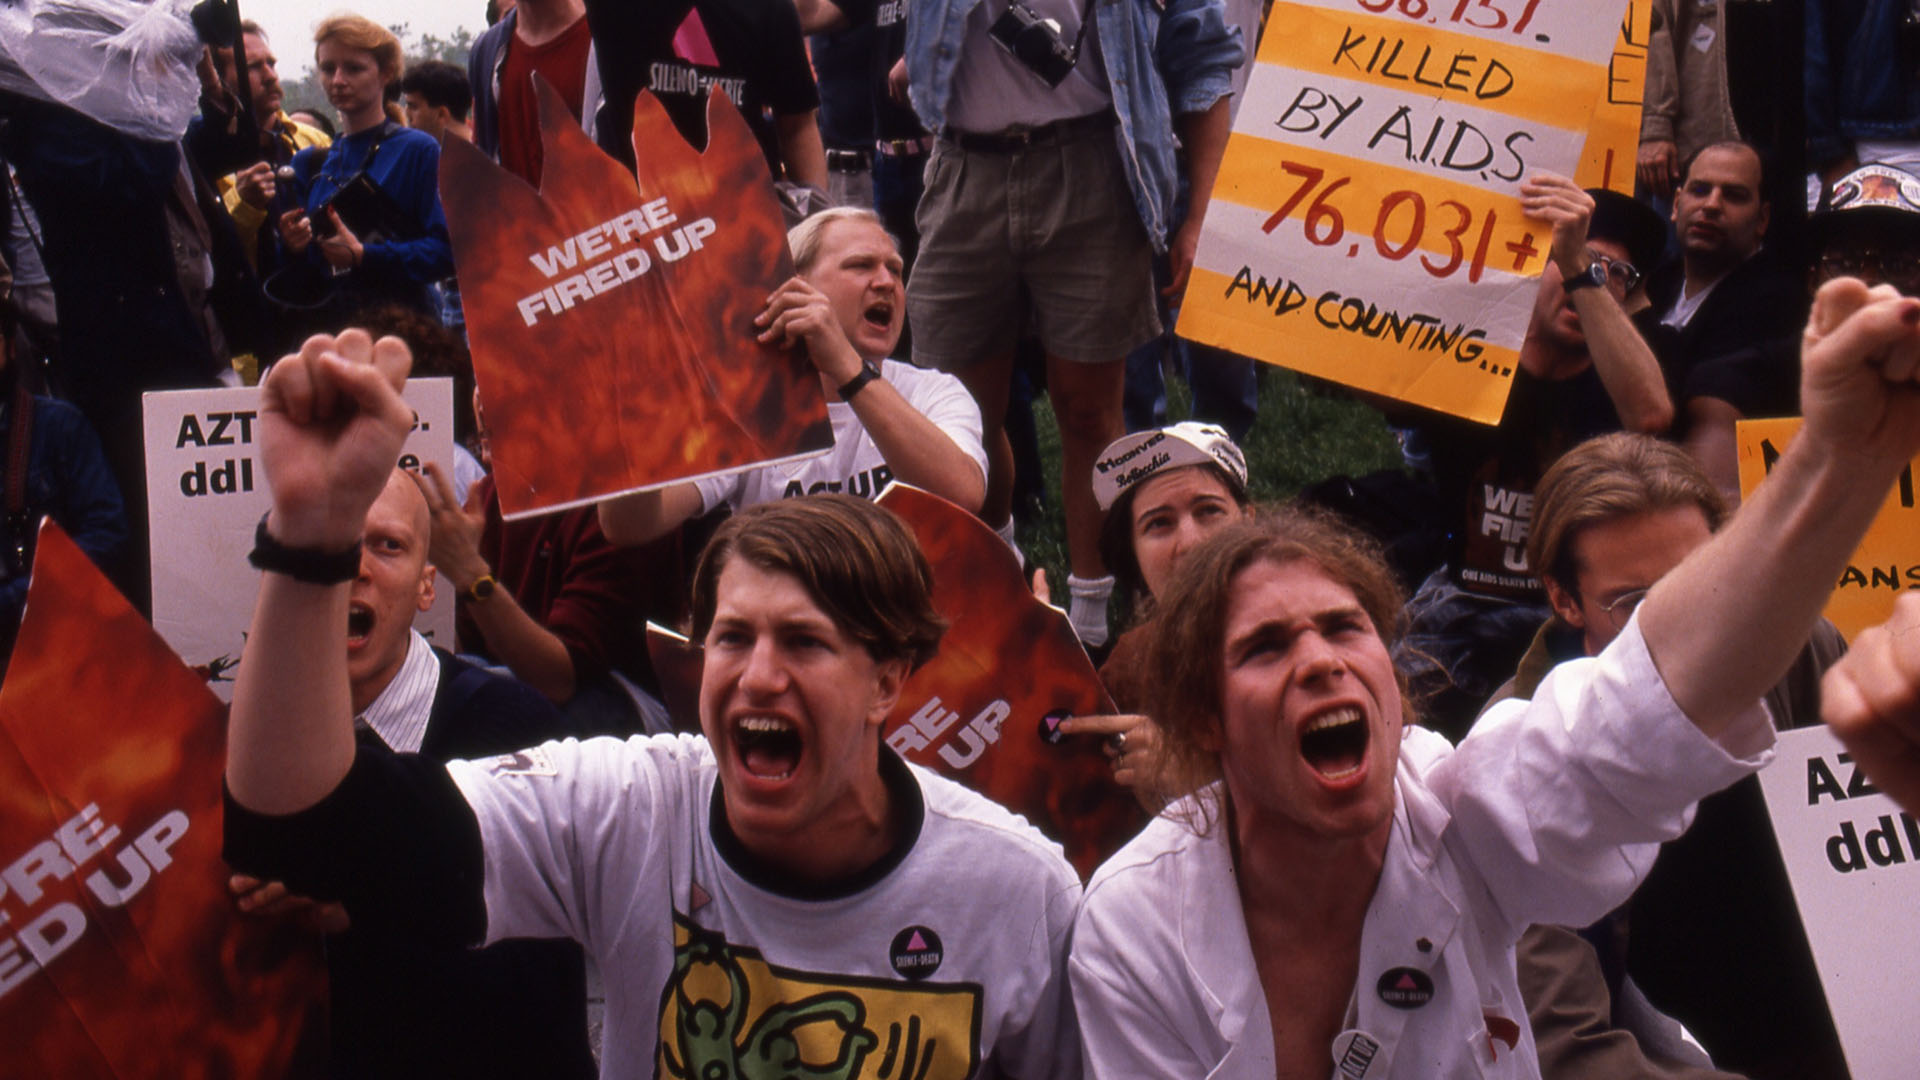 AIDS activists protest via a sit-in